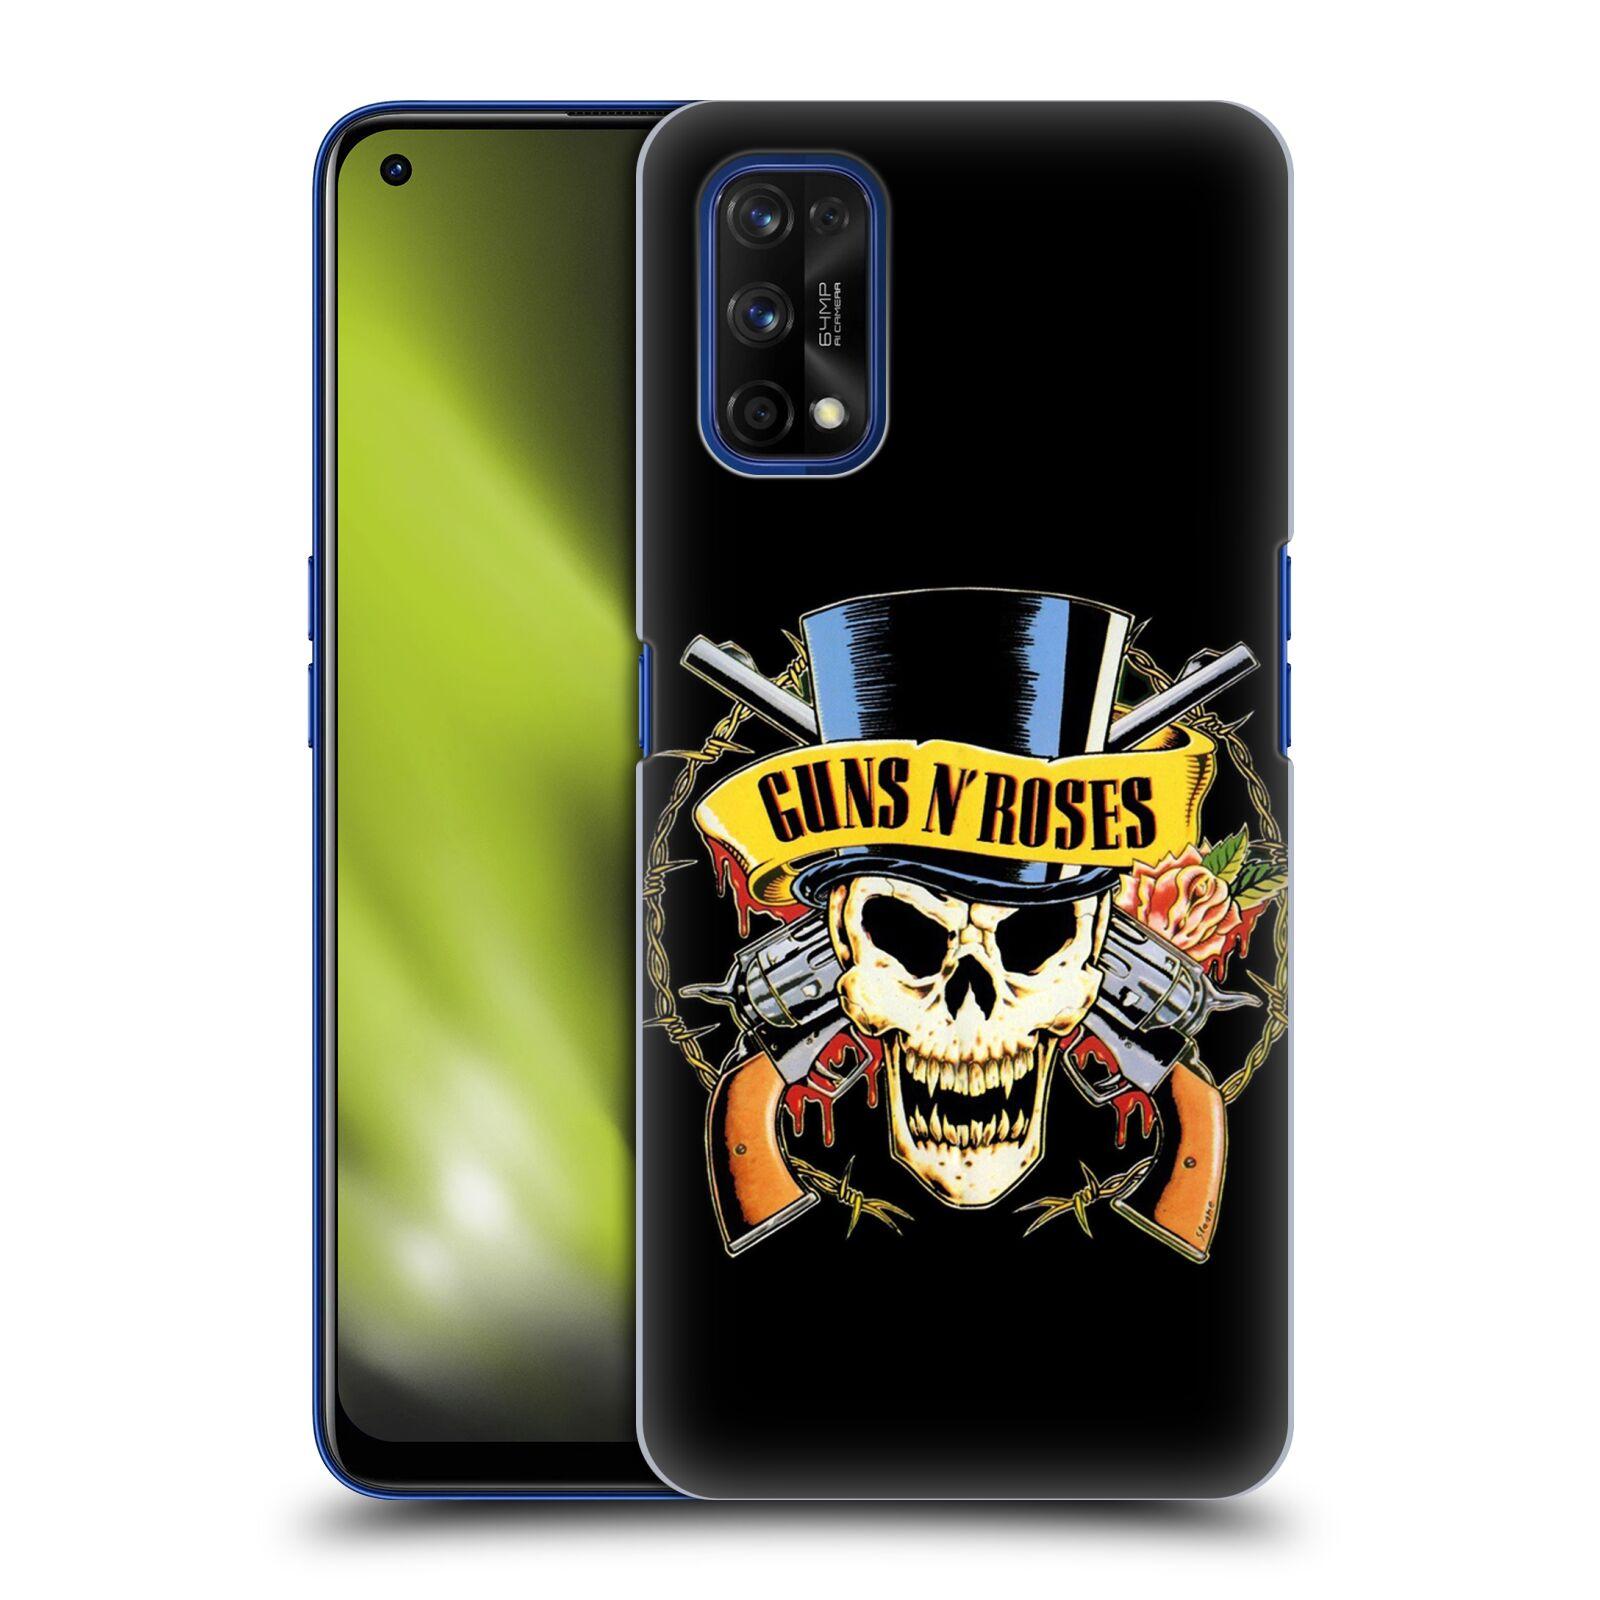 Plastové pouzdro na mobil Realme 7 Pro - Head Case - Guns N' Roses - Lebka